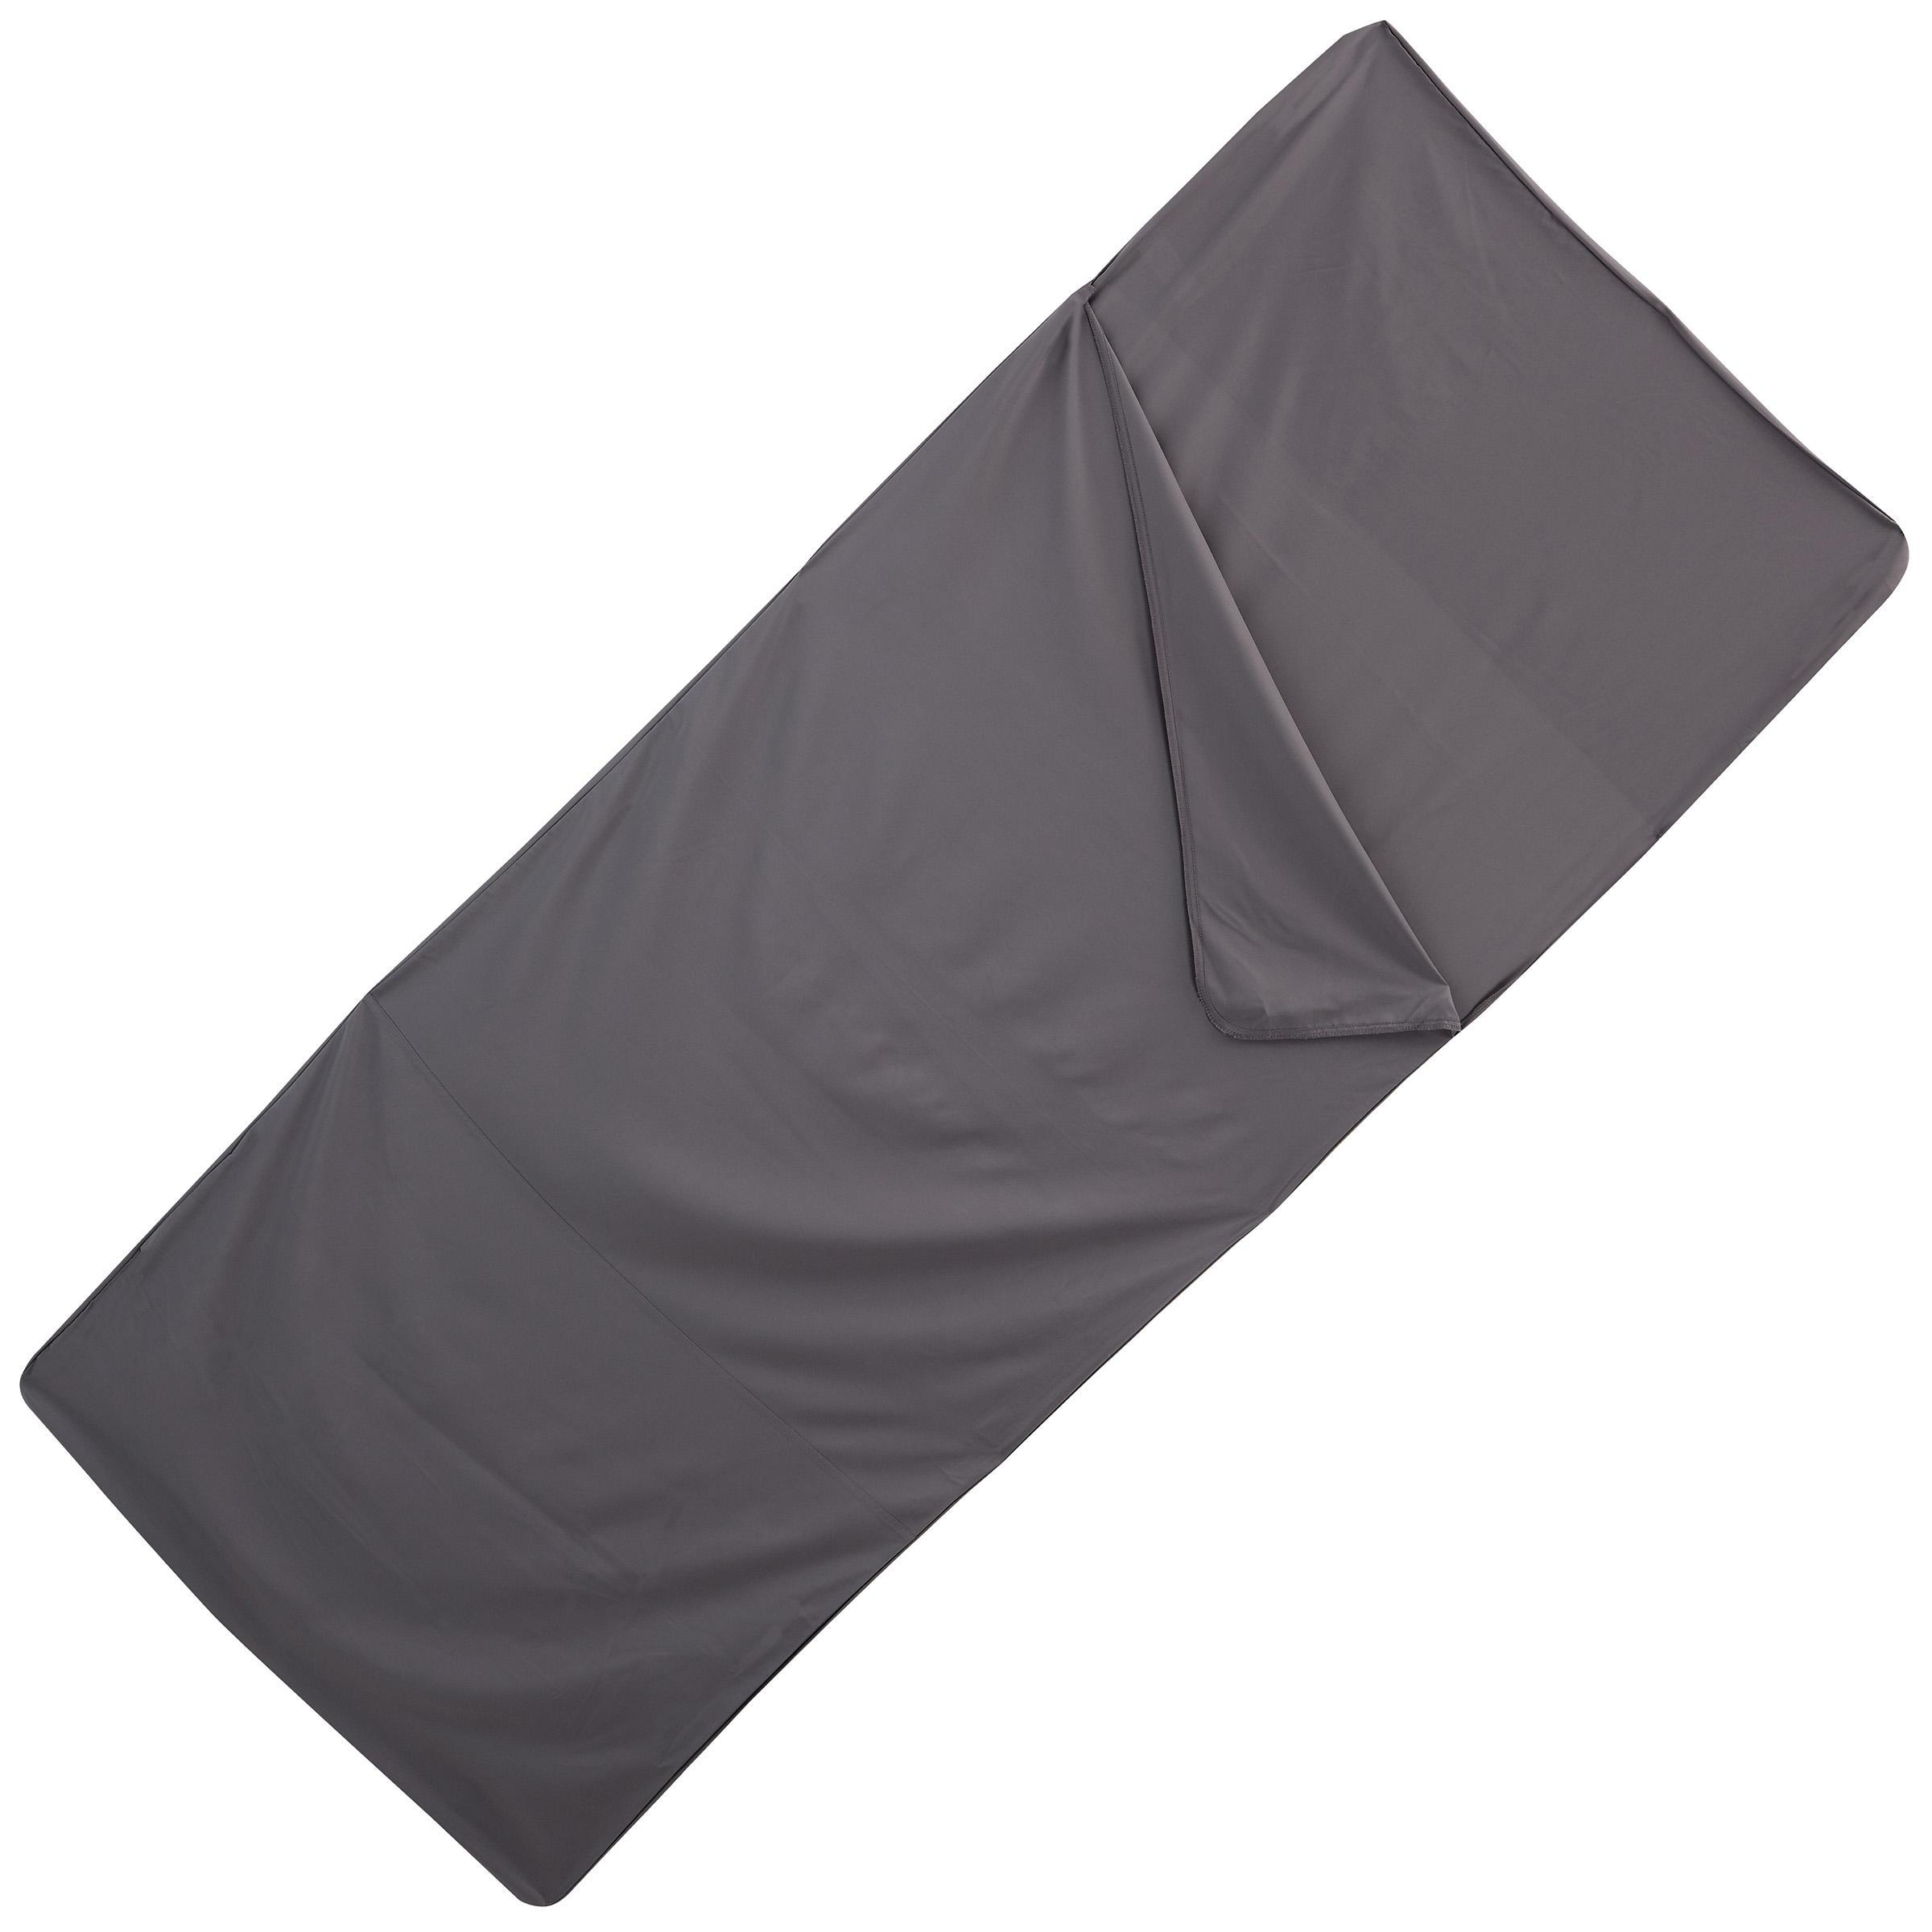 Sábana para bolsa de dormir, poliéster gris